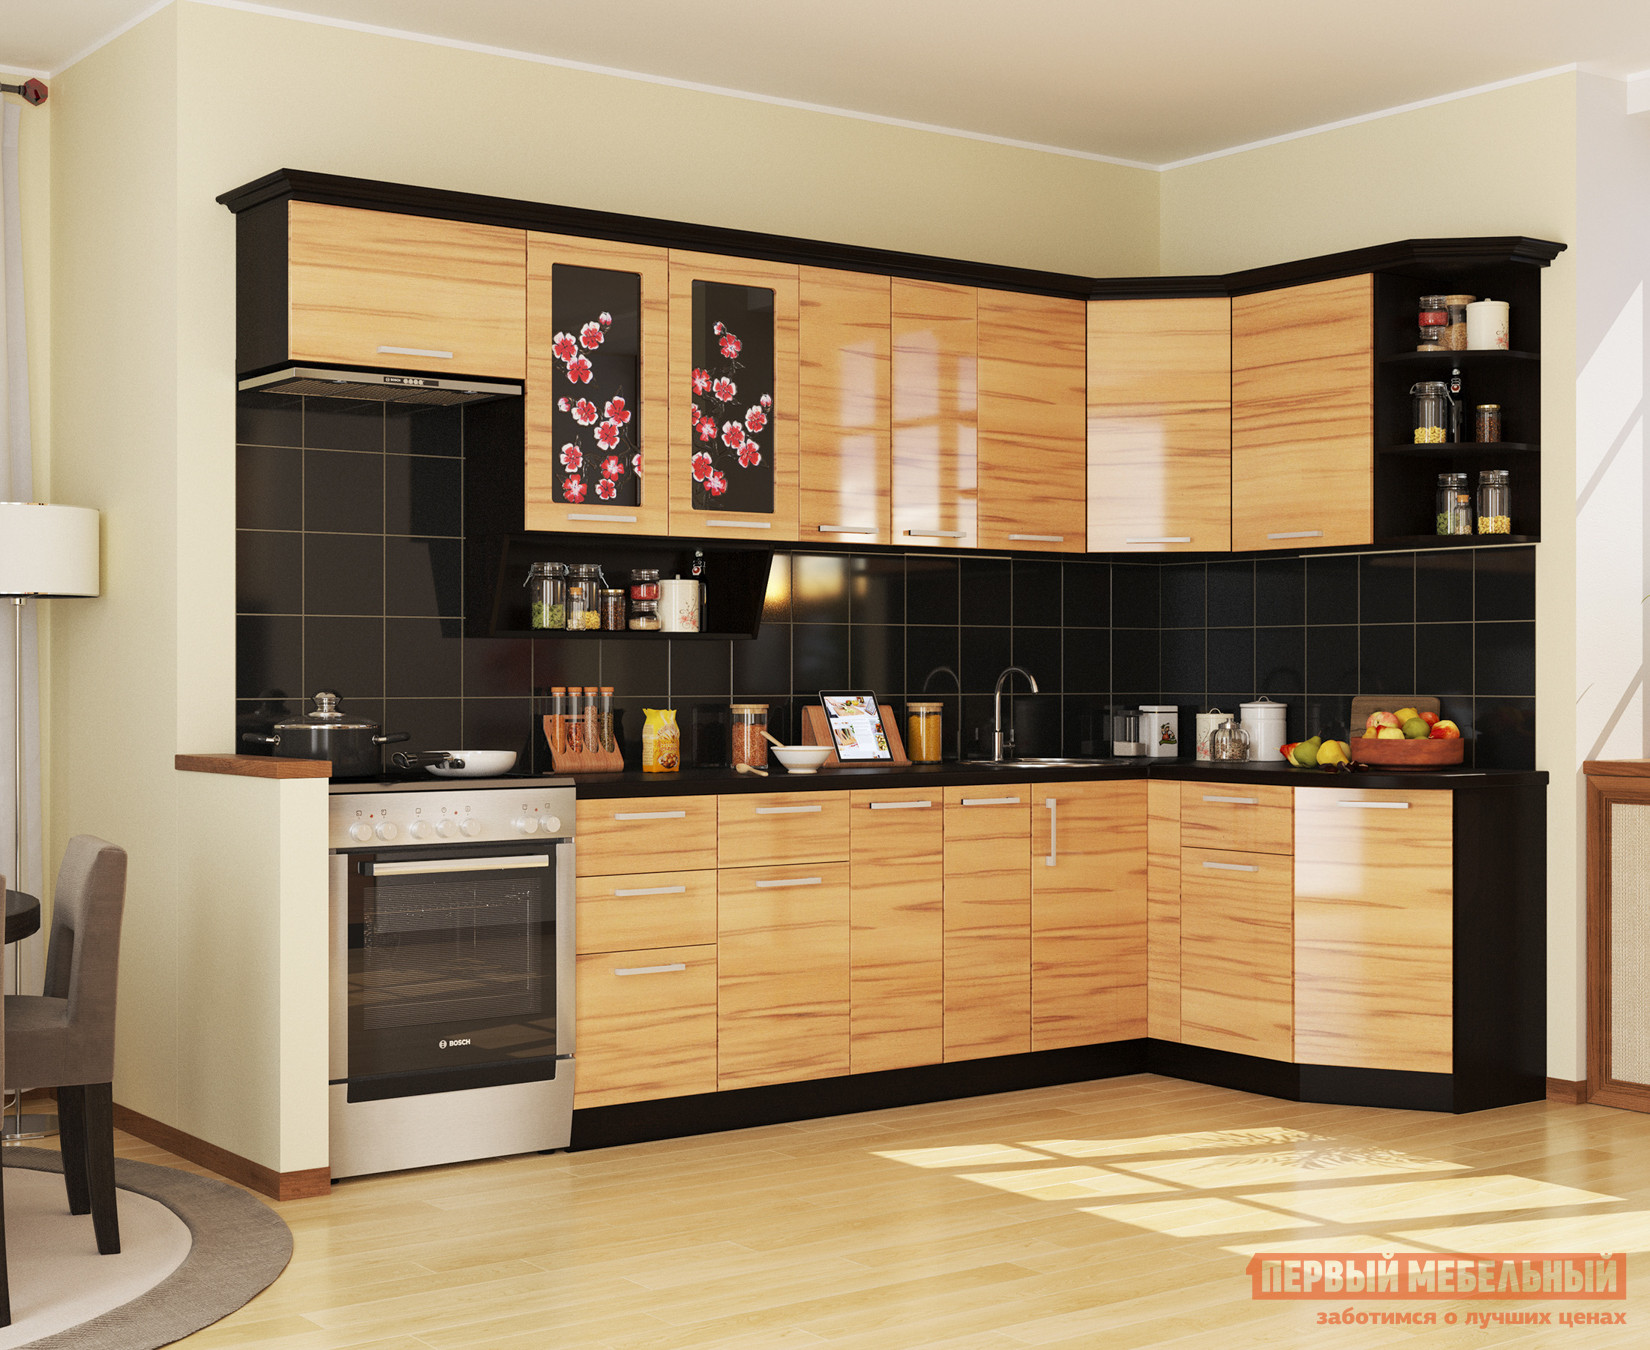 Кухонный гарнитур МО РОСТ Сакура Угол 2 кухонный гарнитур трия фэнтези 120 см